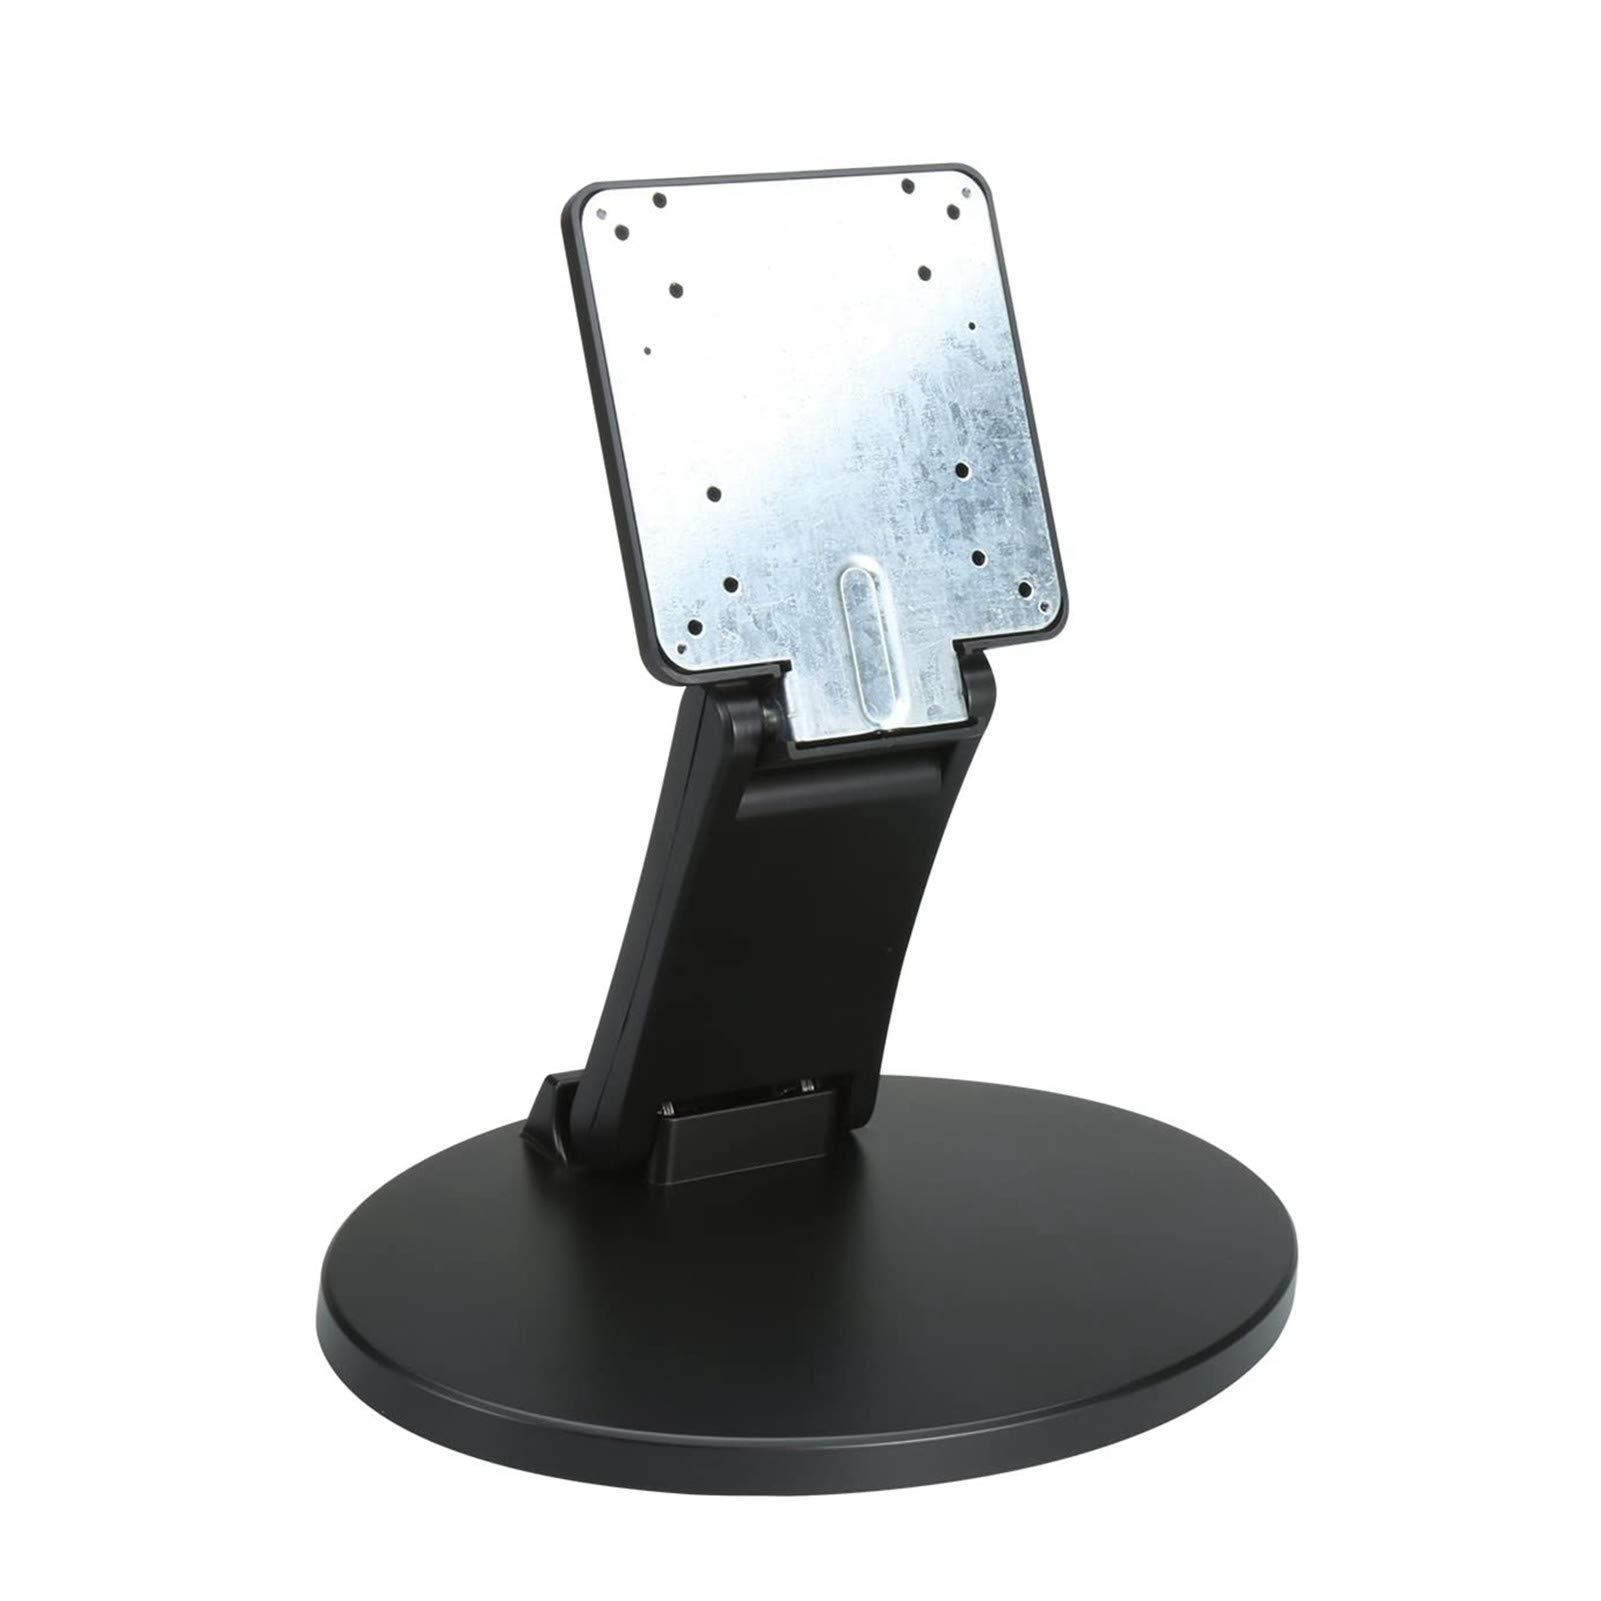 Wearson WS-03C Folding Metal LCD TV Holder Touch Screen Monitor Desk Bracket with VESA Hole 75x75&100x100mm